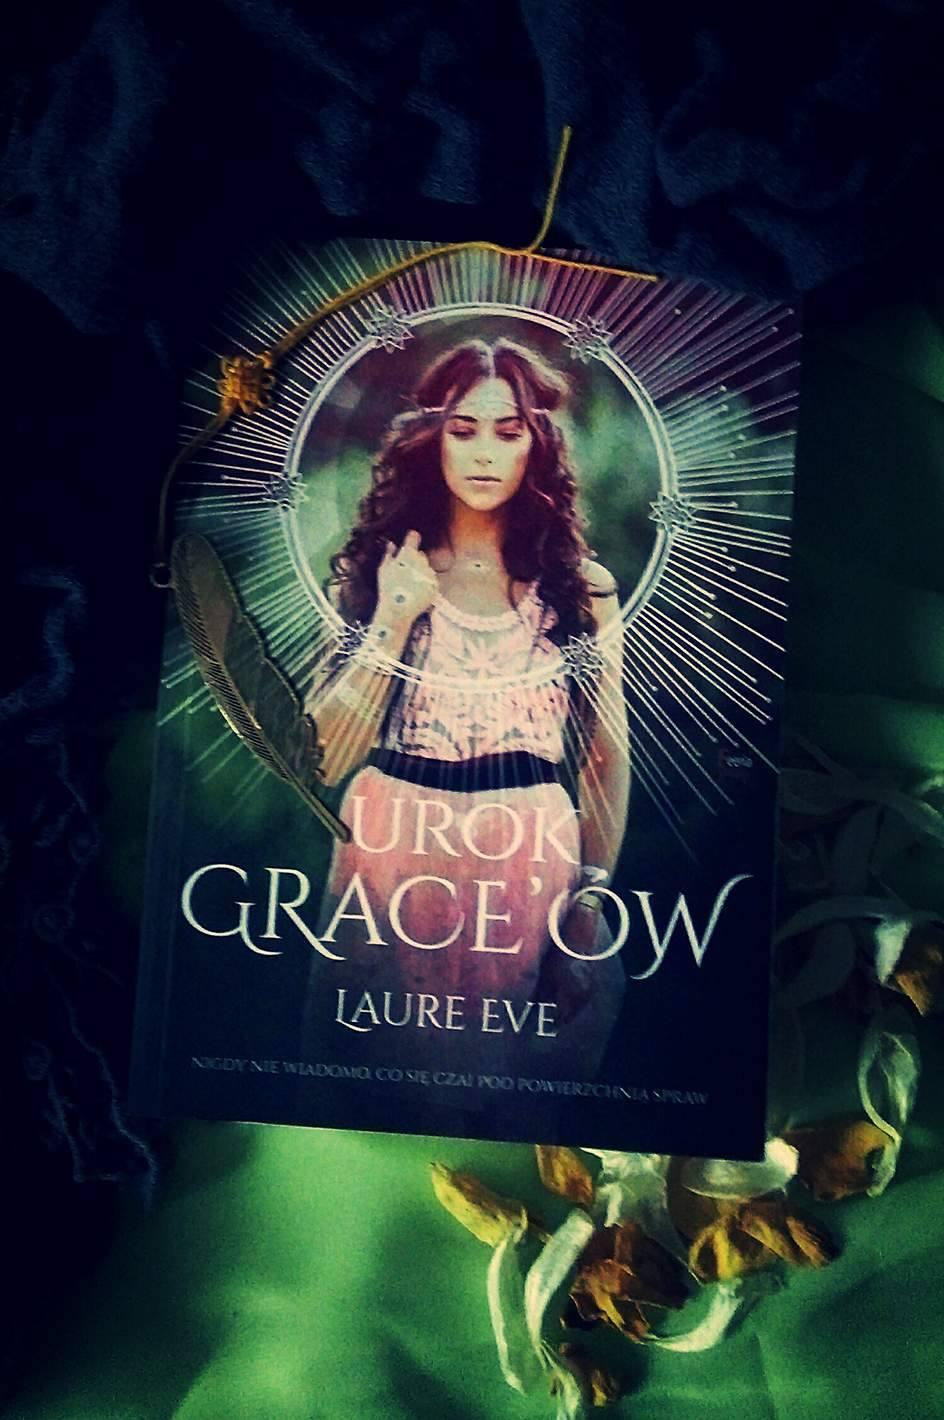 """Urok Grace'ów"" Laure Eve"